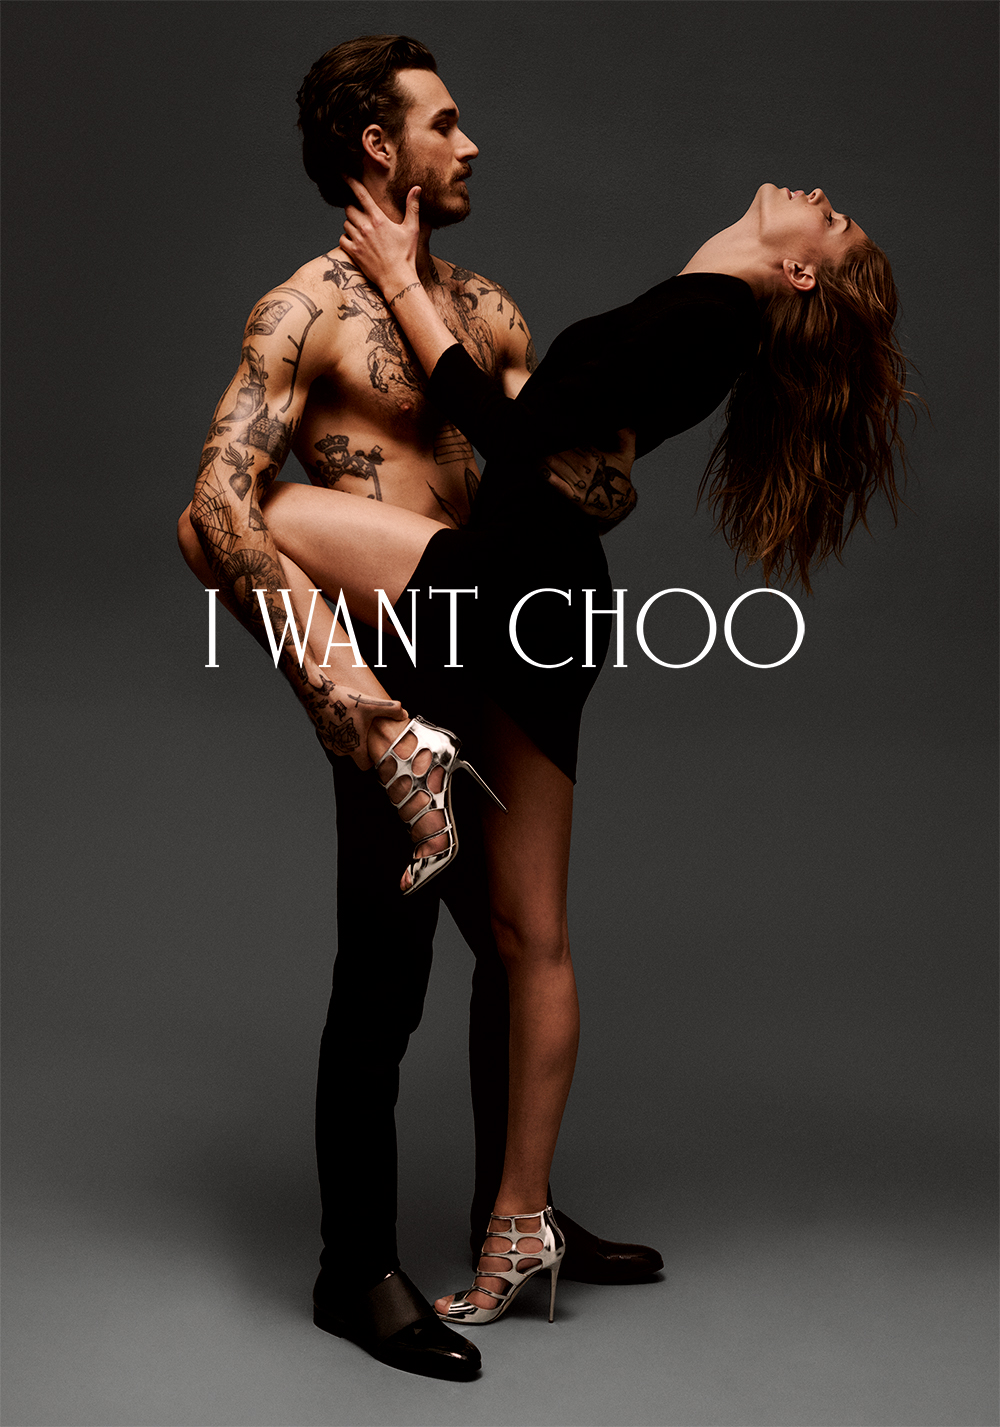 I-WANT-CHOO